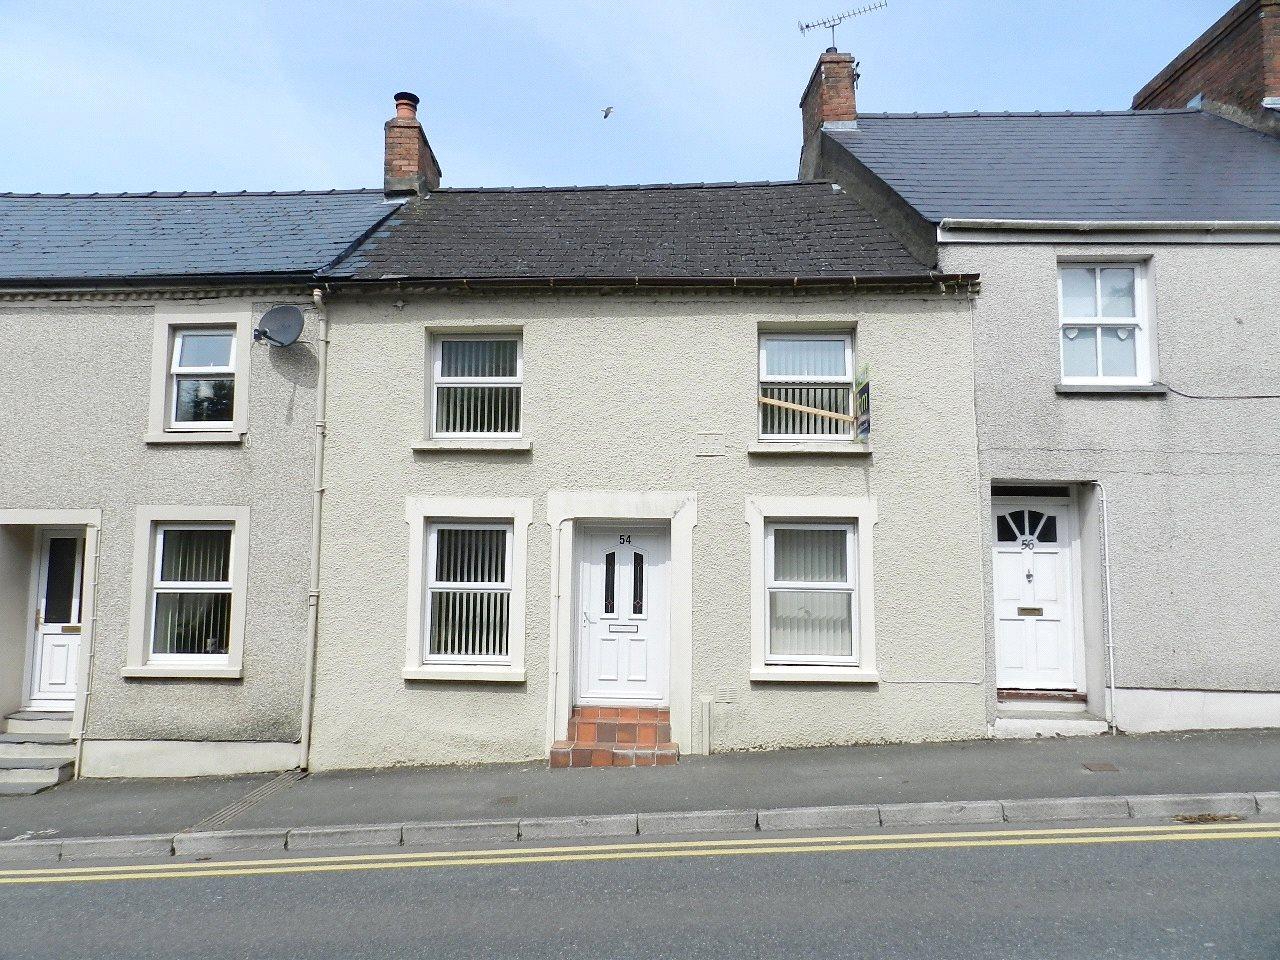 3 Bedrooms Terraced House for sale in Prendergast, Haverfordwest, Pembrokeshire